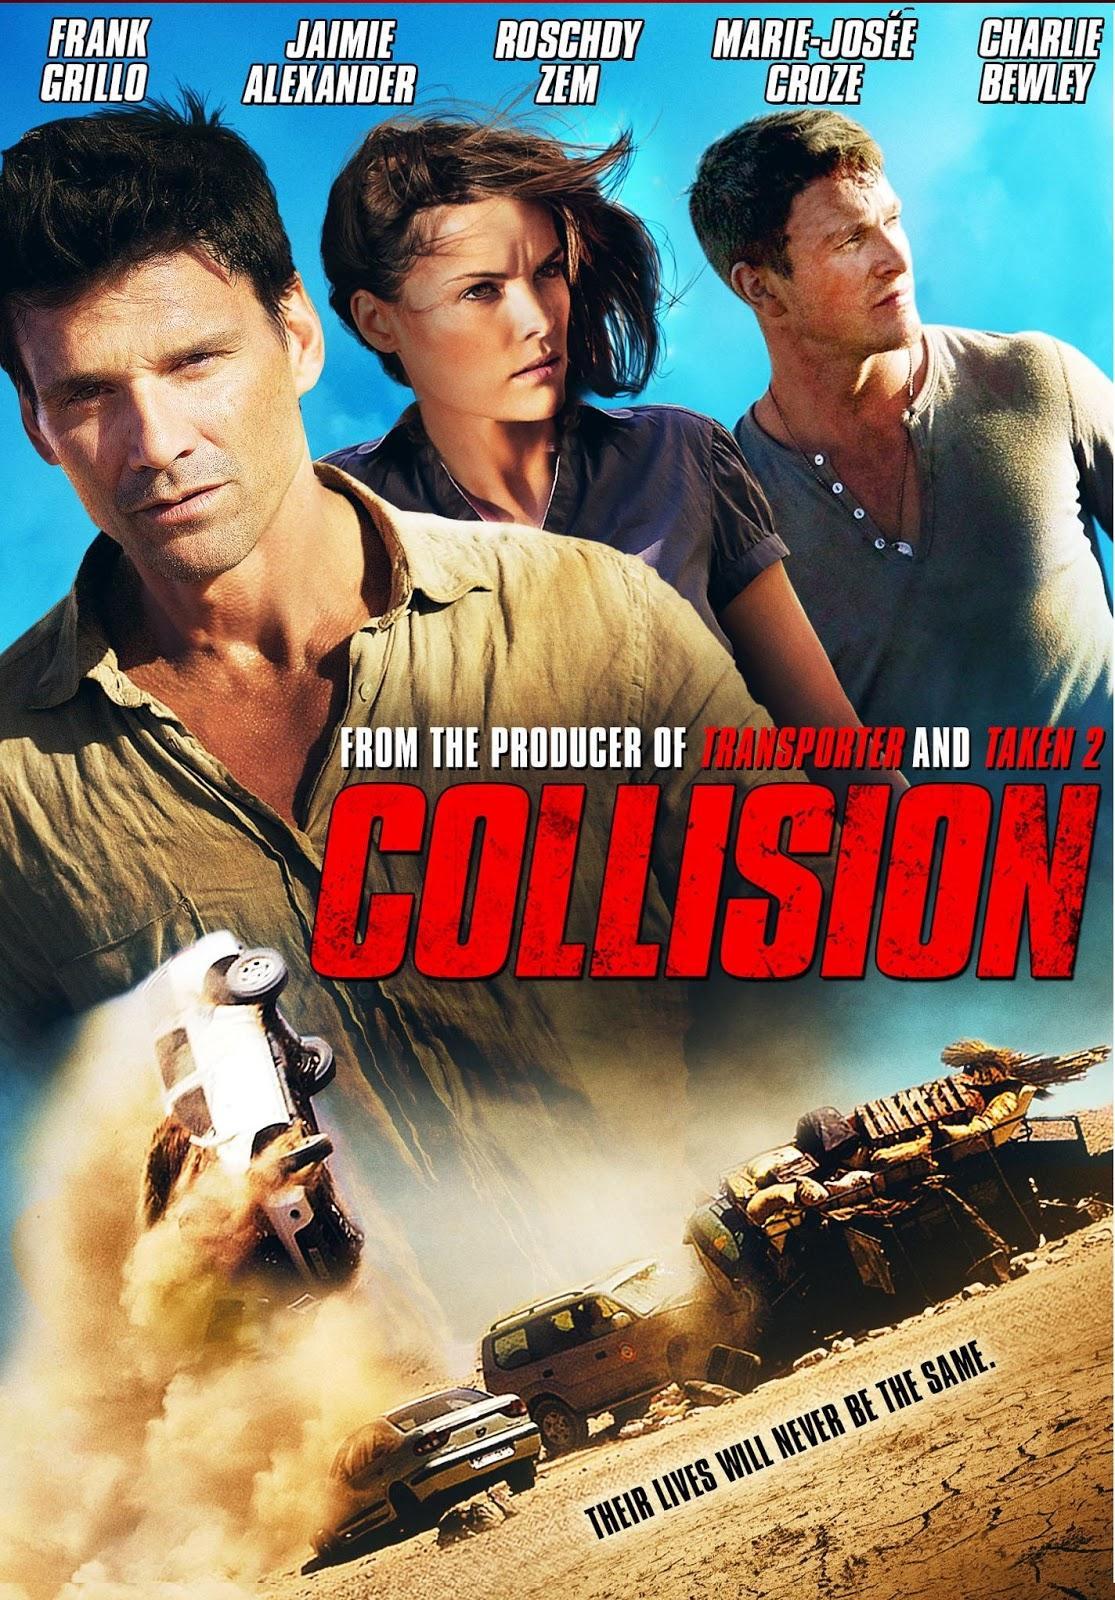 Collision%202013.1 1 دانلود فیلم Collision 2013